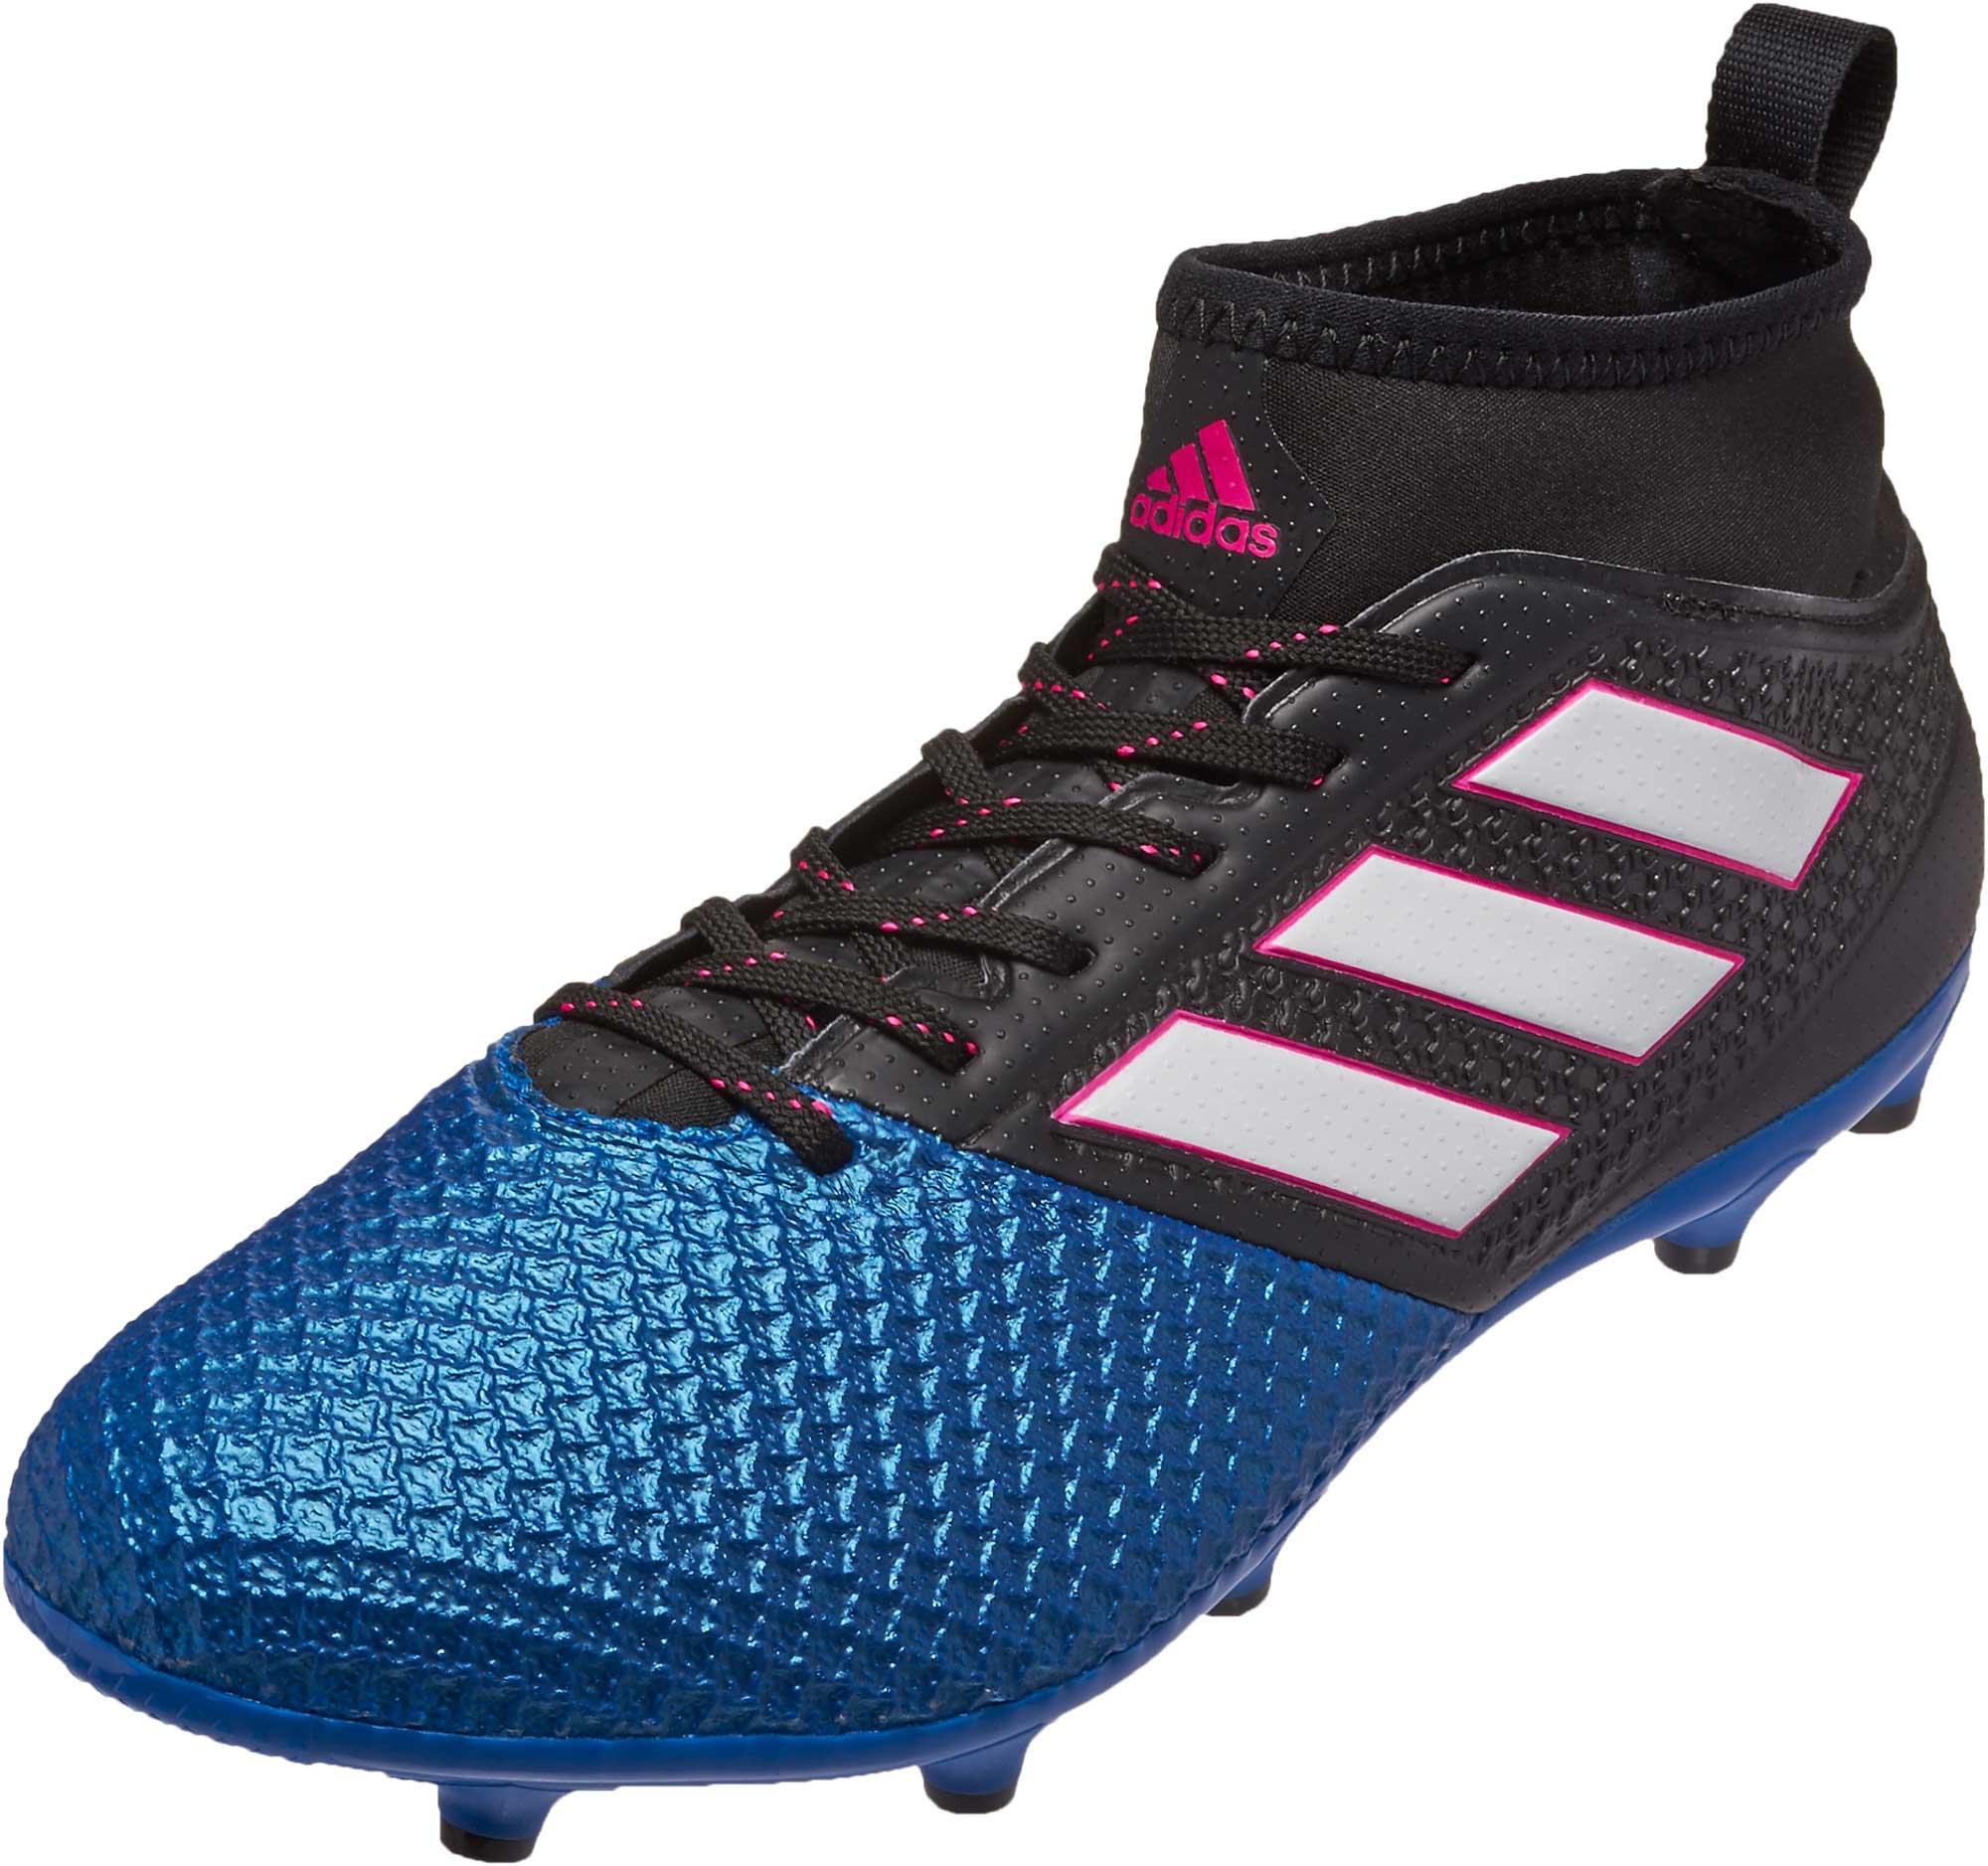 1e11119b214 ... czech adidas ace 17.3 primemesh fg soccer cleats black blue soccer  6df1a 654d1